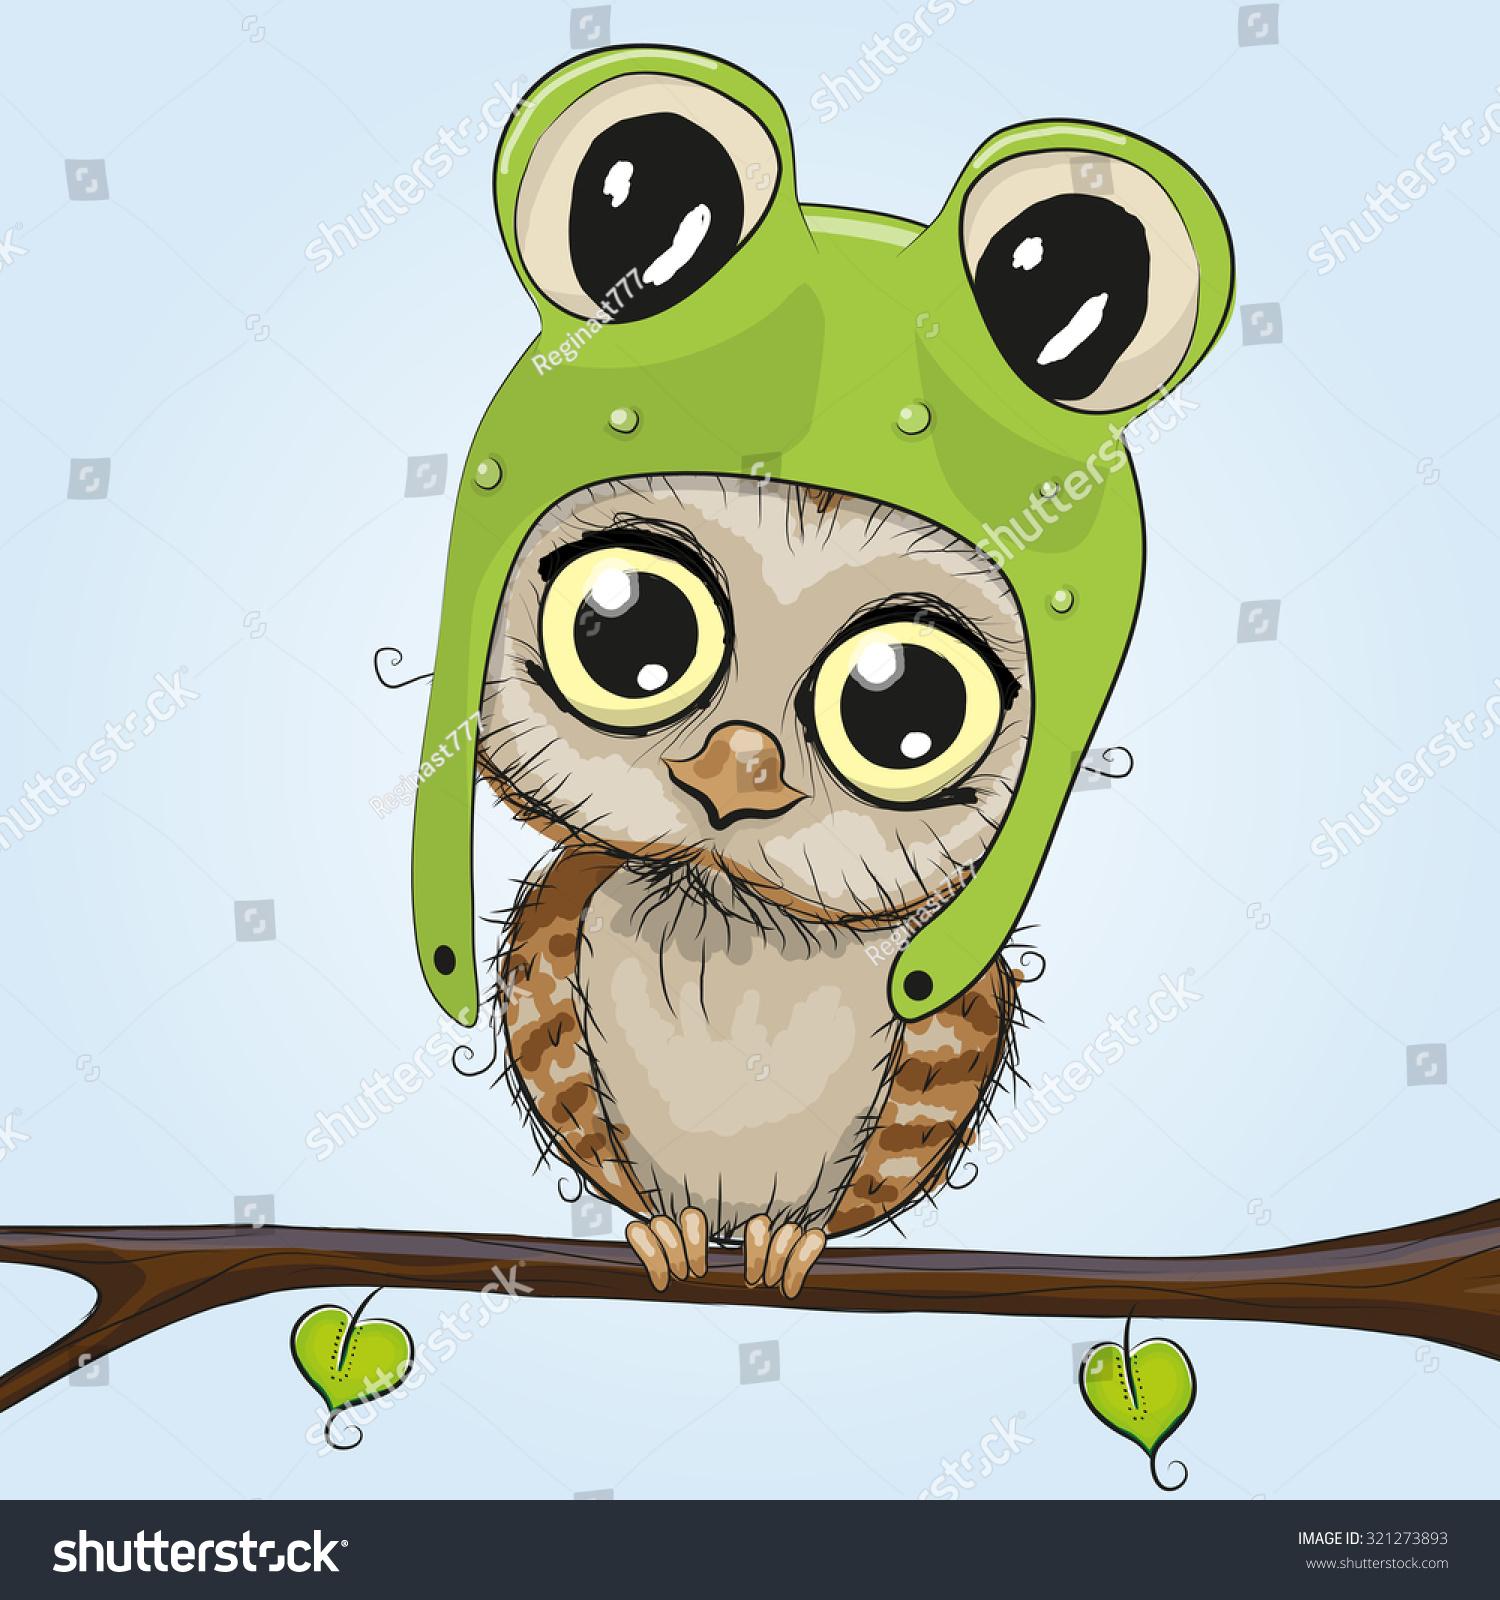 Cute cartoon owls on a branch - photo#21